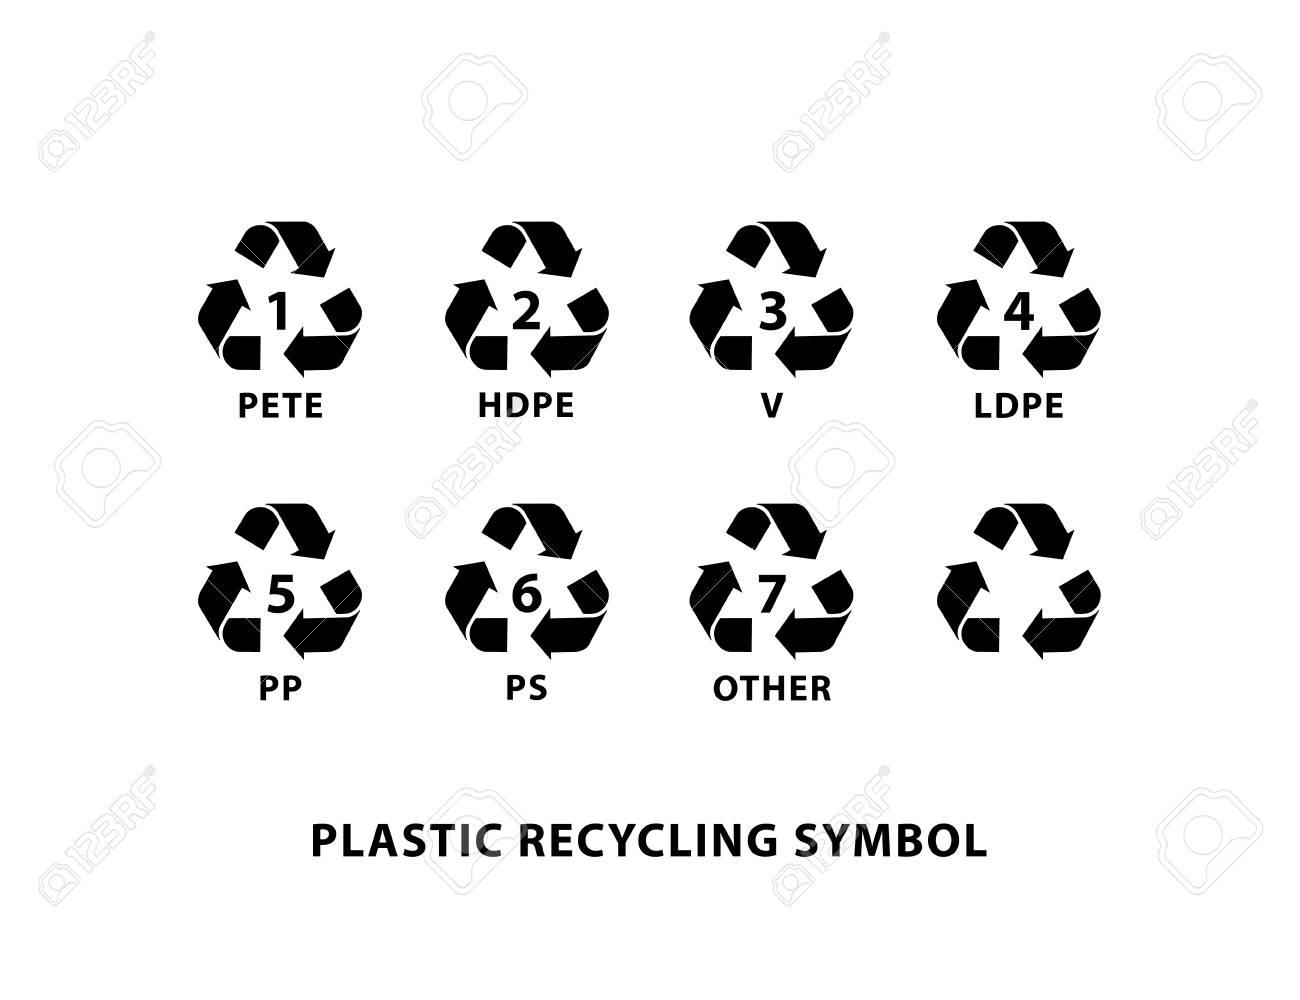 Plastic recycling symbol set icon vector illustration on white plastic recycling symbol set icon vector illustration on white background stock vector 81814908 buycottarizona